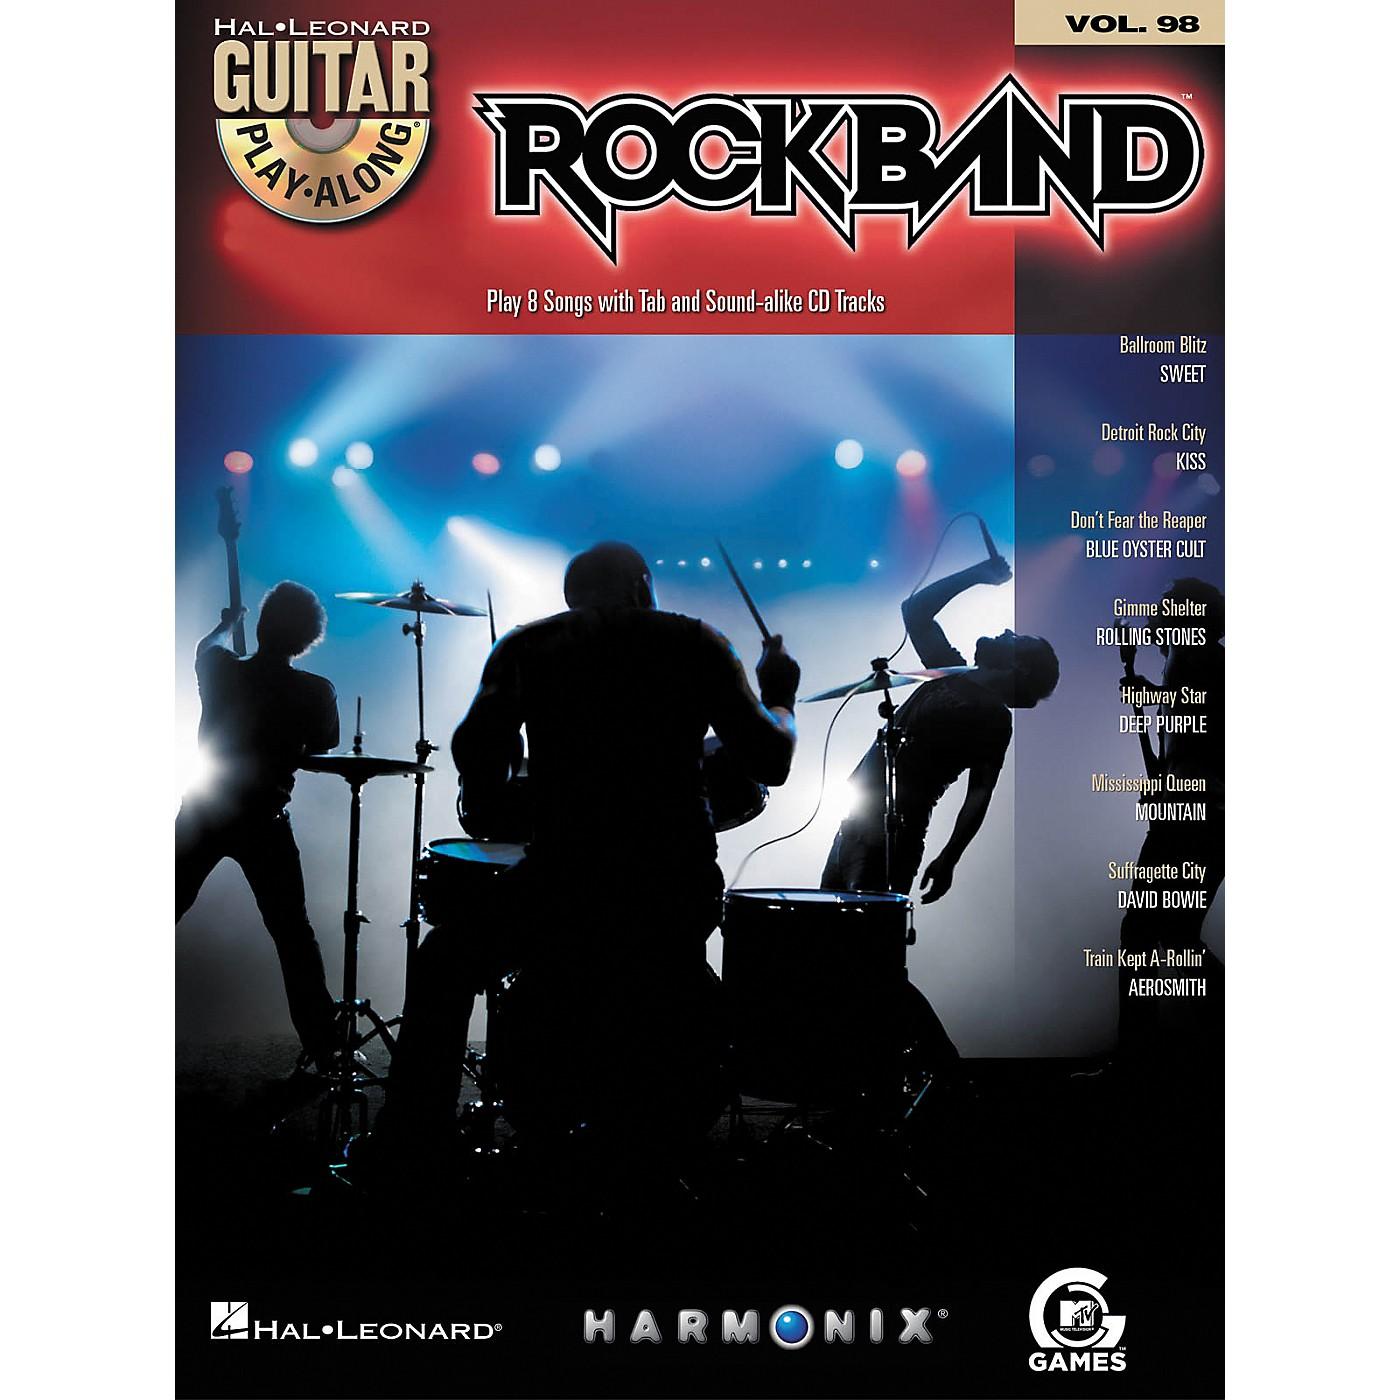 Hal Leonard Rock Band - Classic Rock Edition - Guitar Play-Along Volume 98 Book/CD Set thumbnail